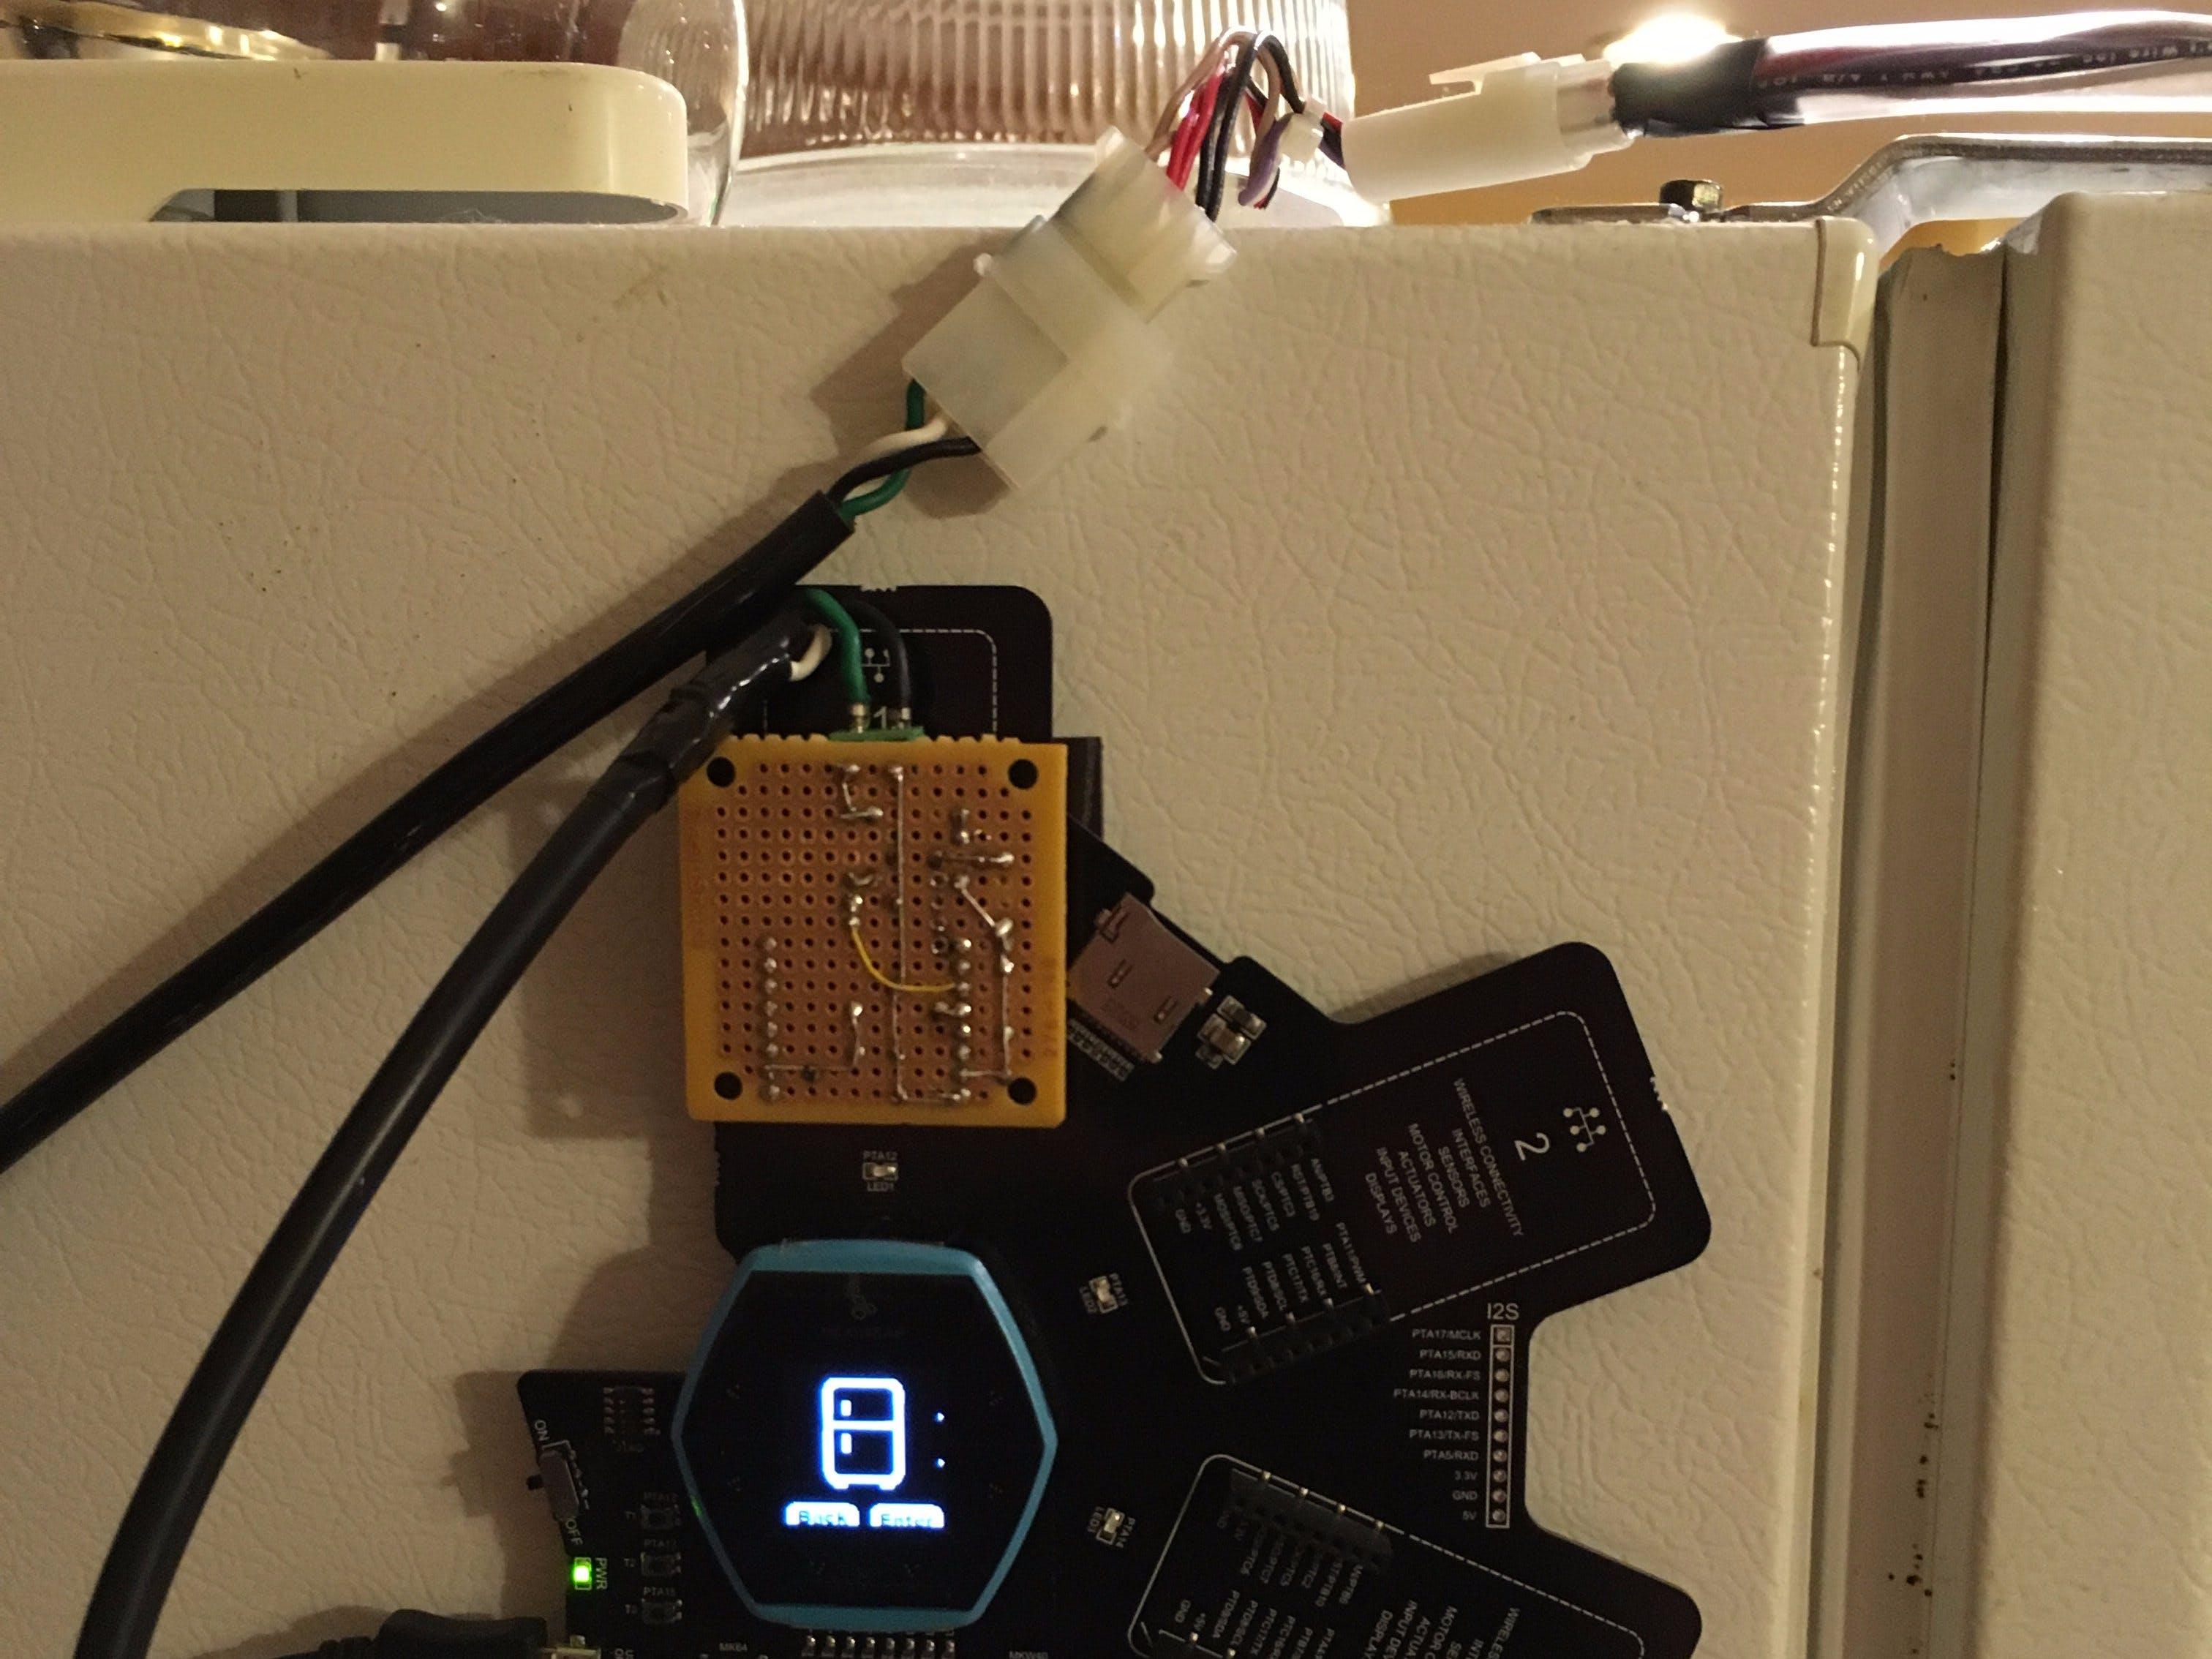 Smart Refrigerator Magnet